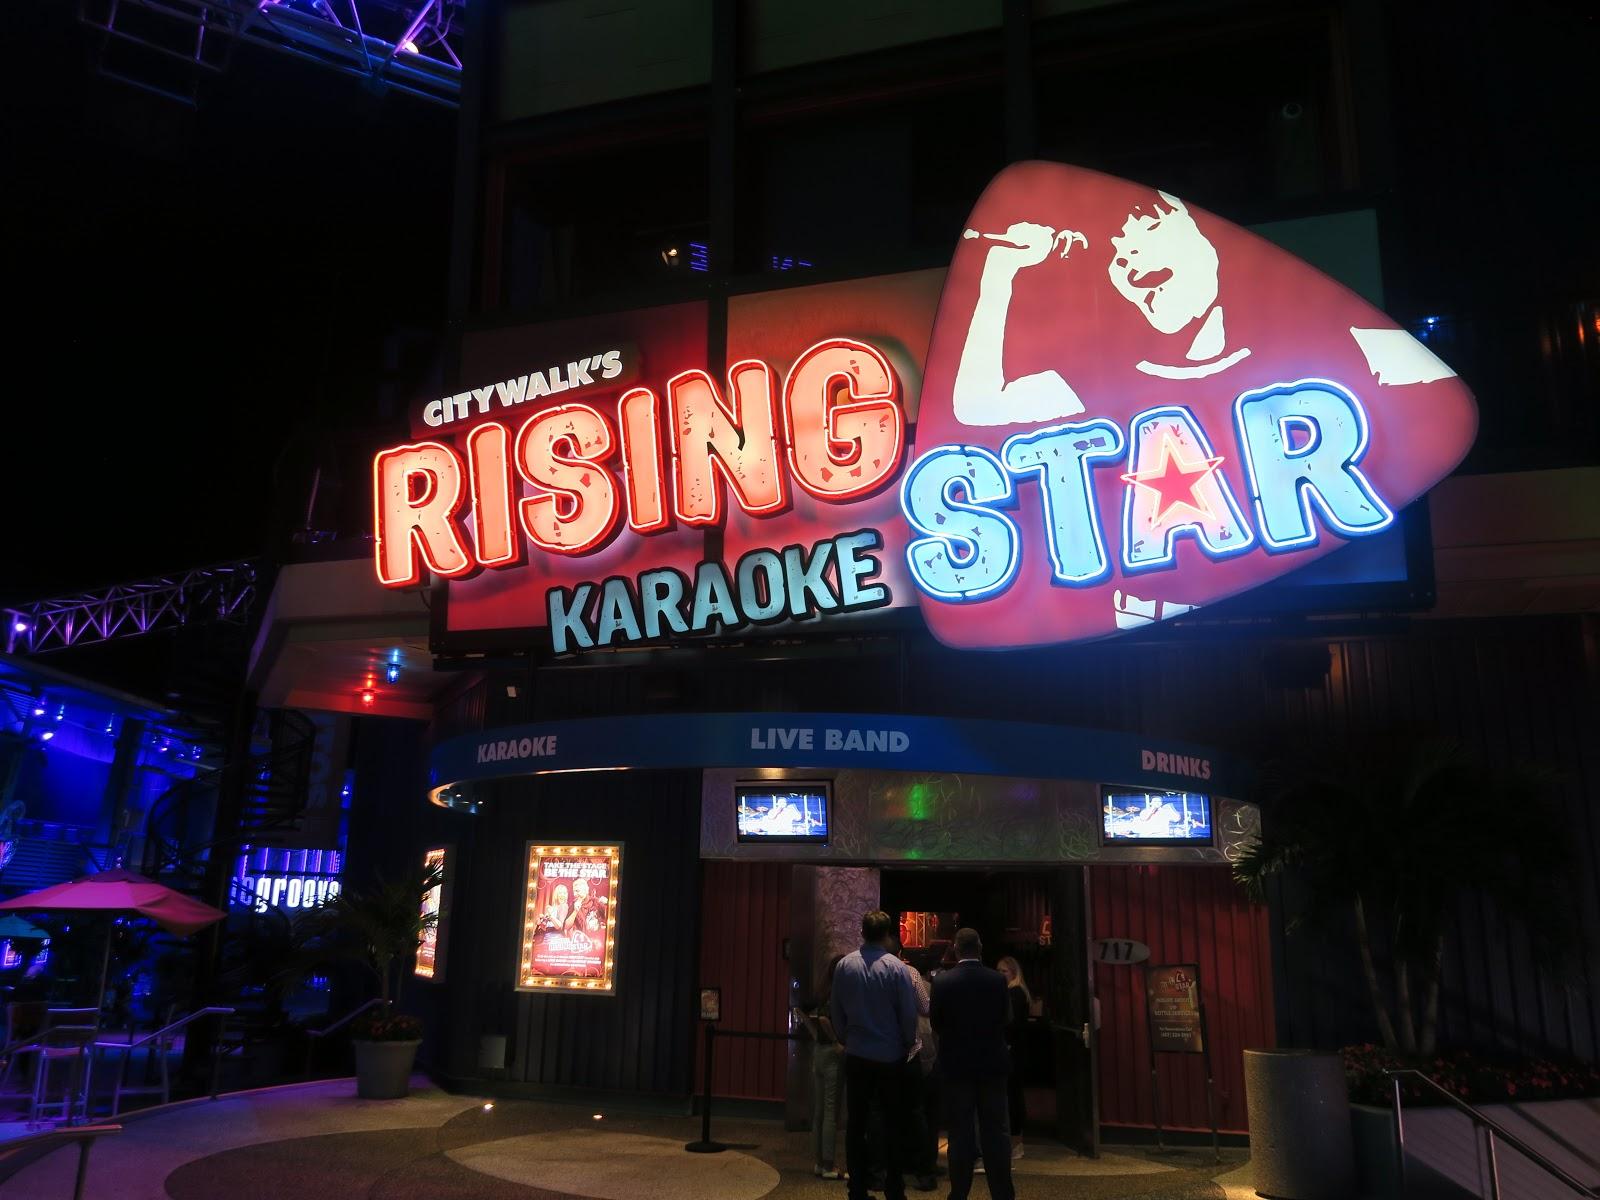 Universal Citywalk Rising Star